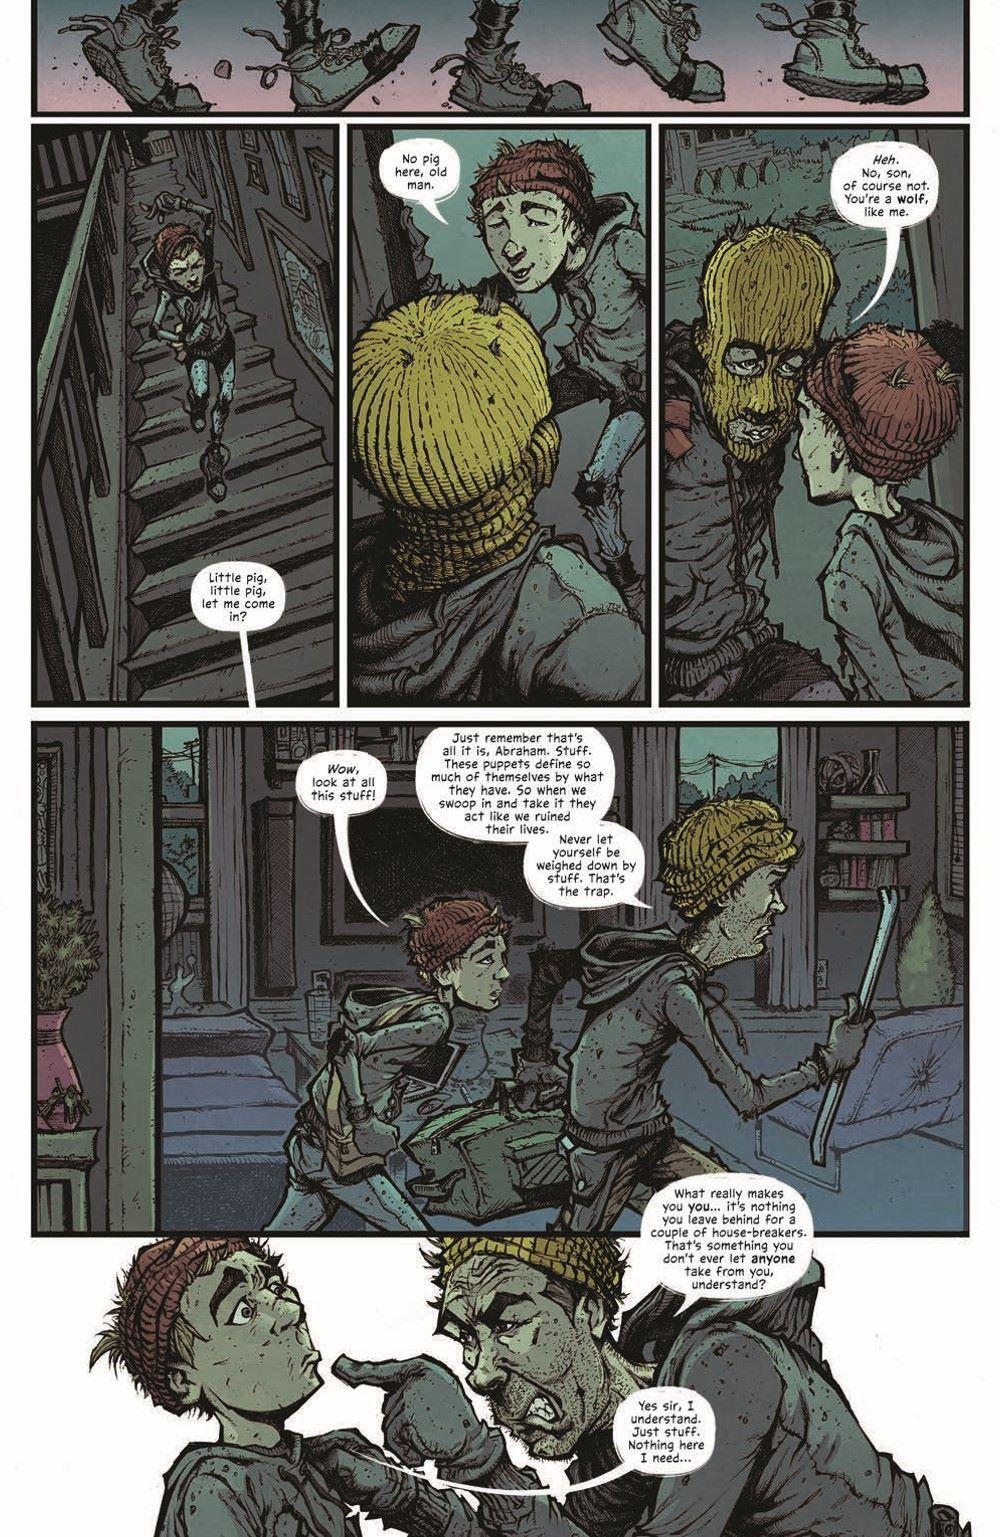 MTNH-TPB_pr-7 ComicList Previews: MOUNTAINHEAD VOLUME 1 TP